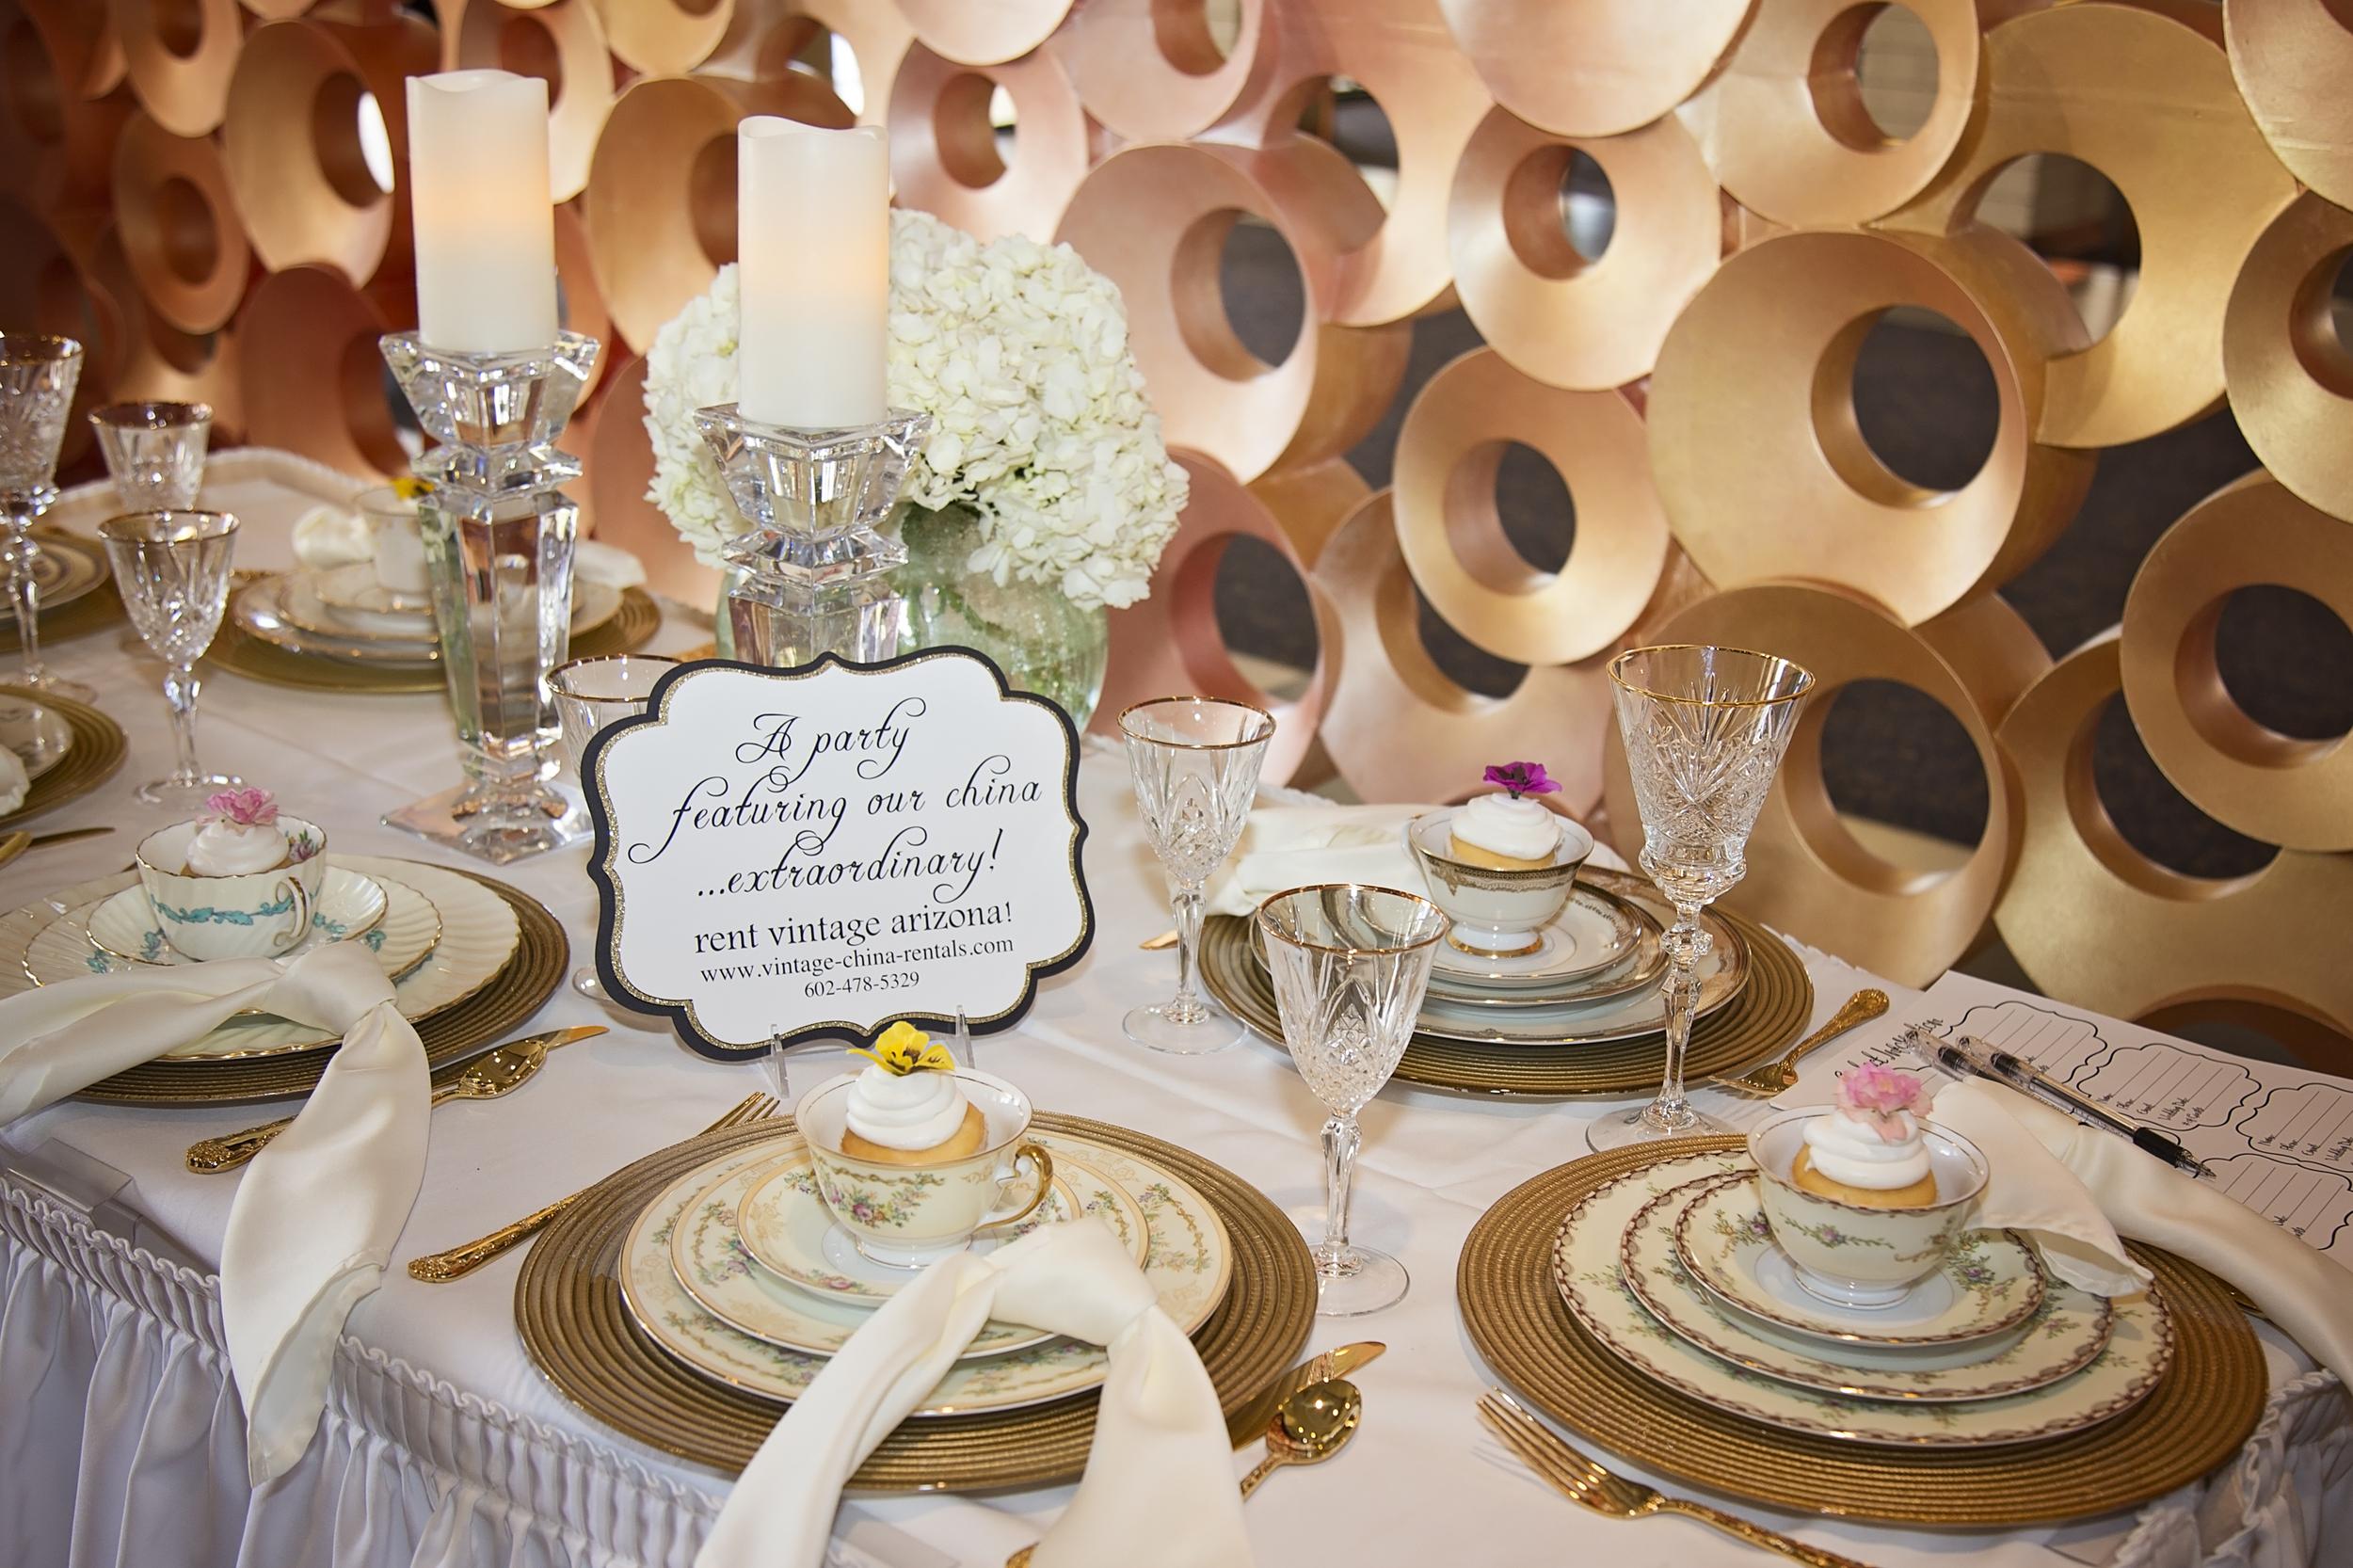 Enchanted Wedding Tours - Tea 1.30.16-41.jpg